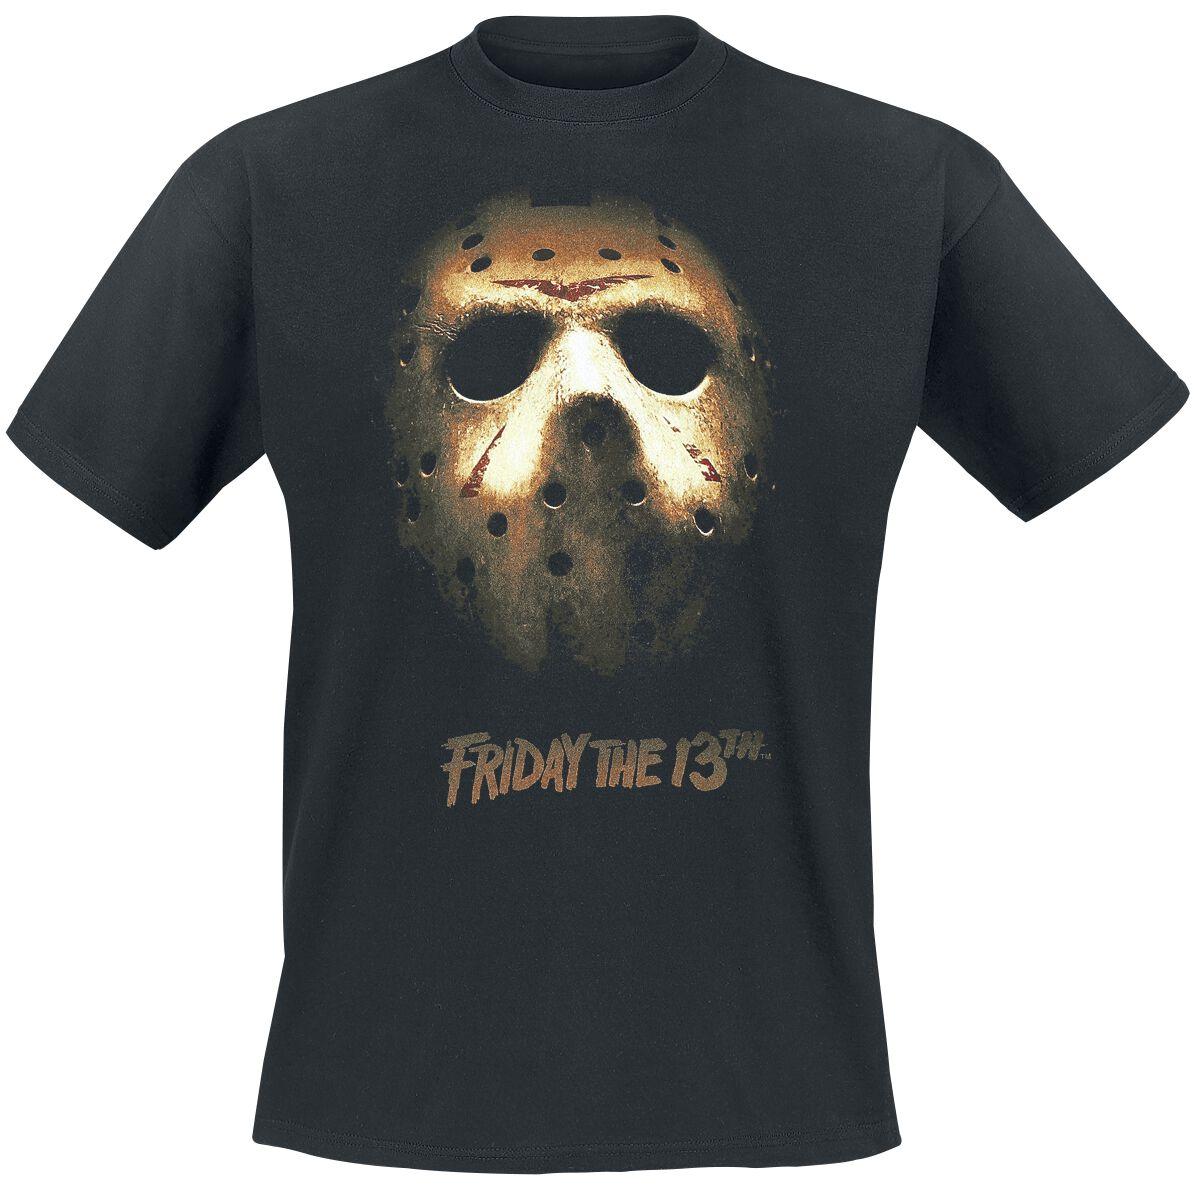 Merch dla Fanów - Koszulki - T-Shirt Friday The 13th Mask T-Shirt czarny - 371805